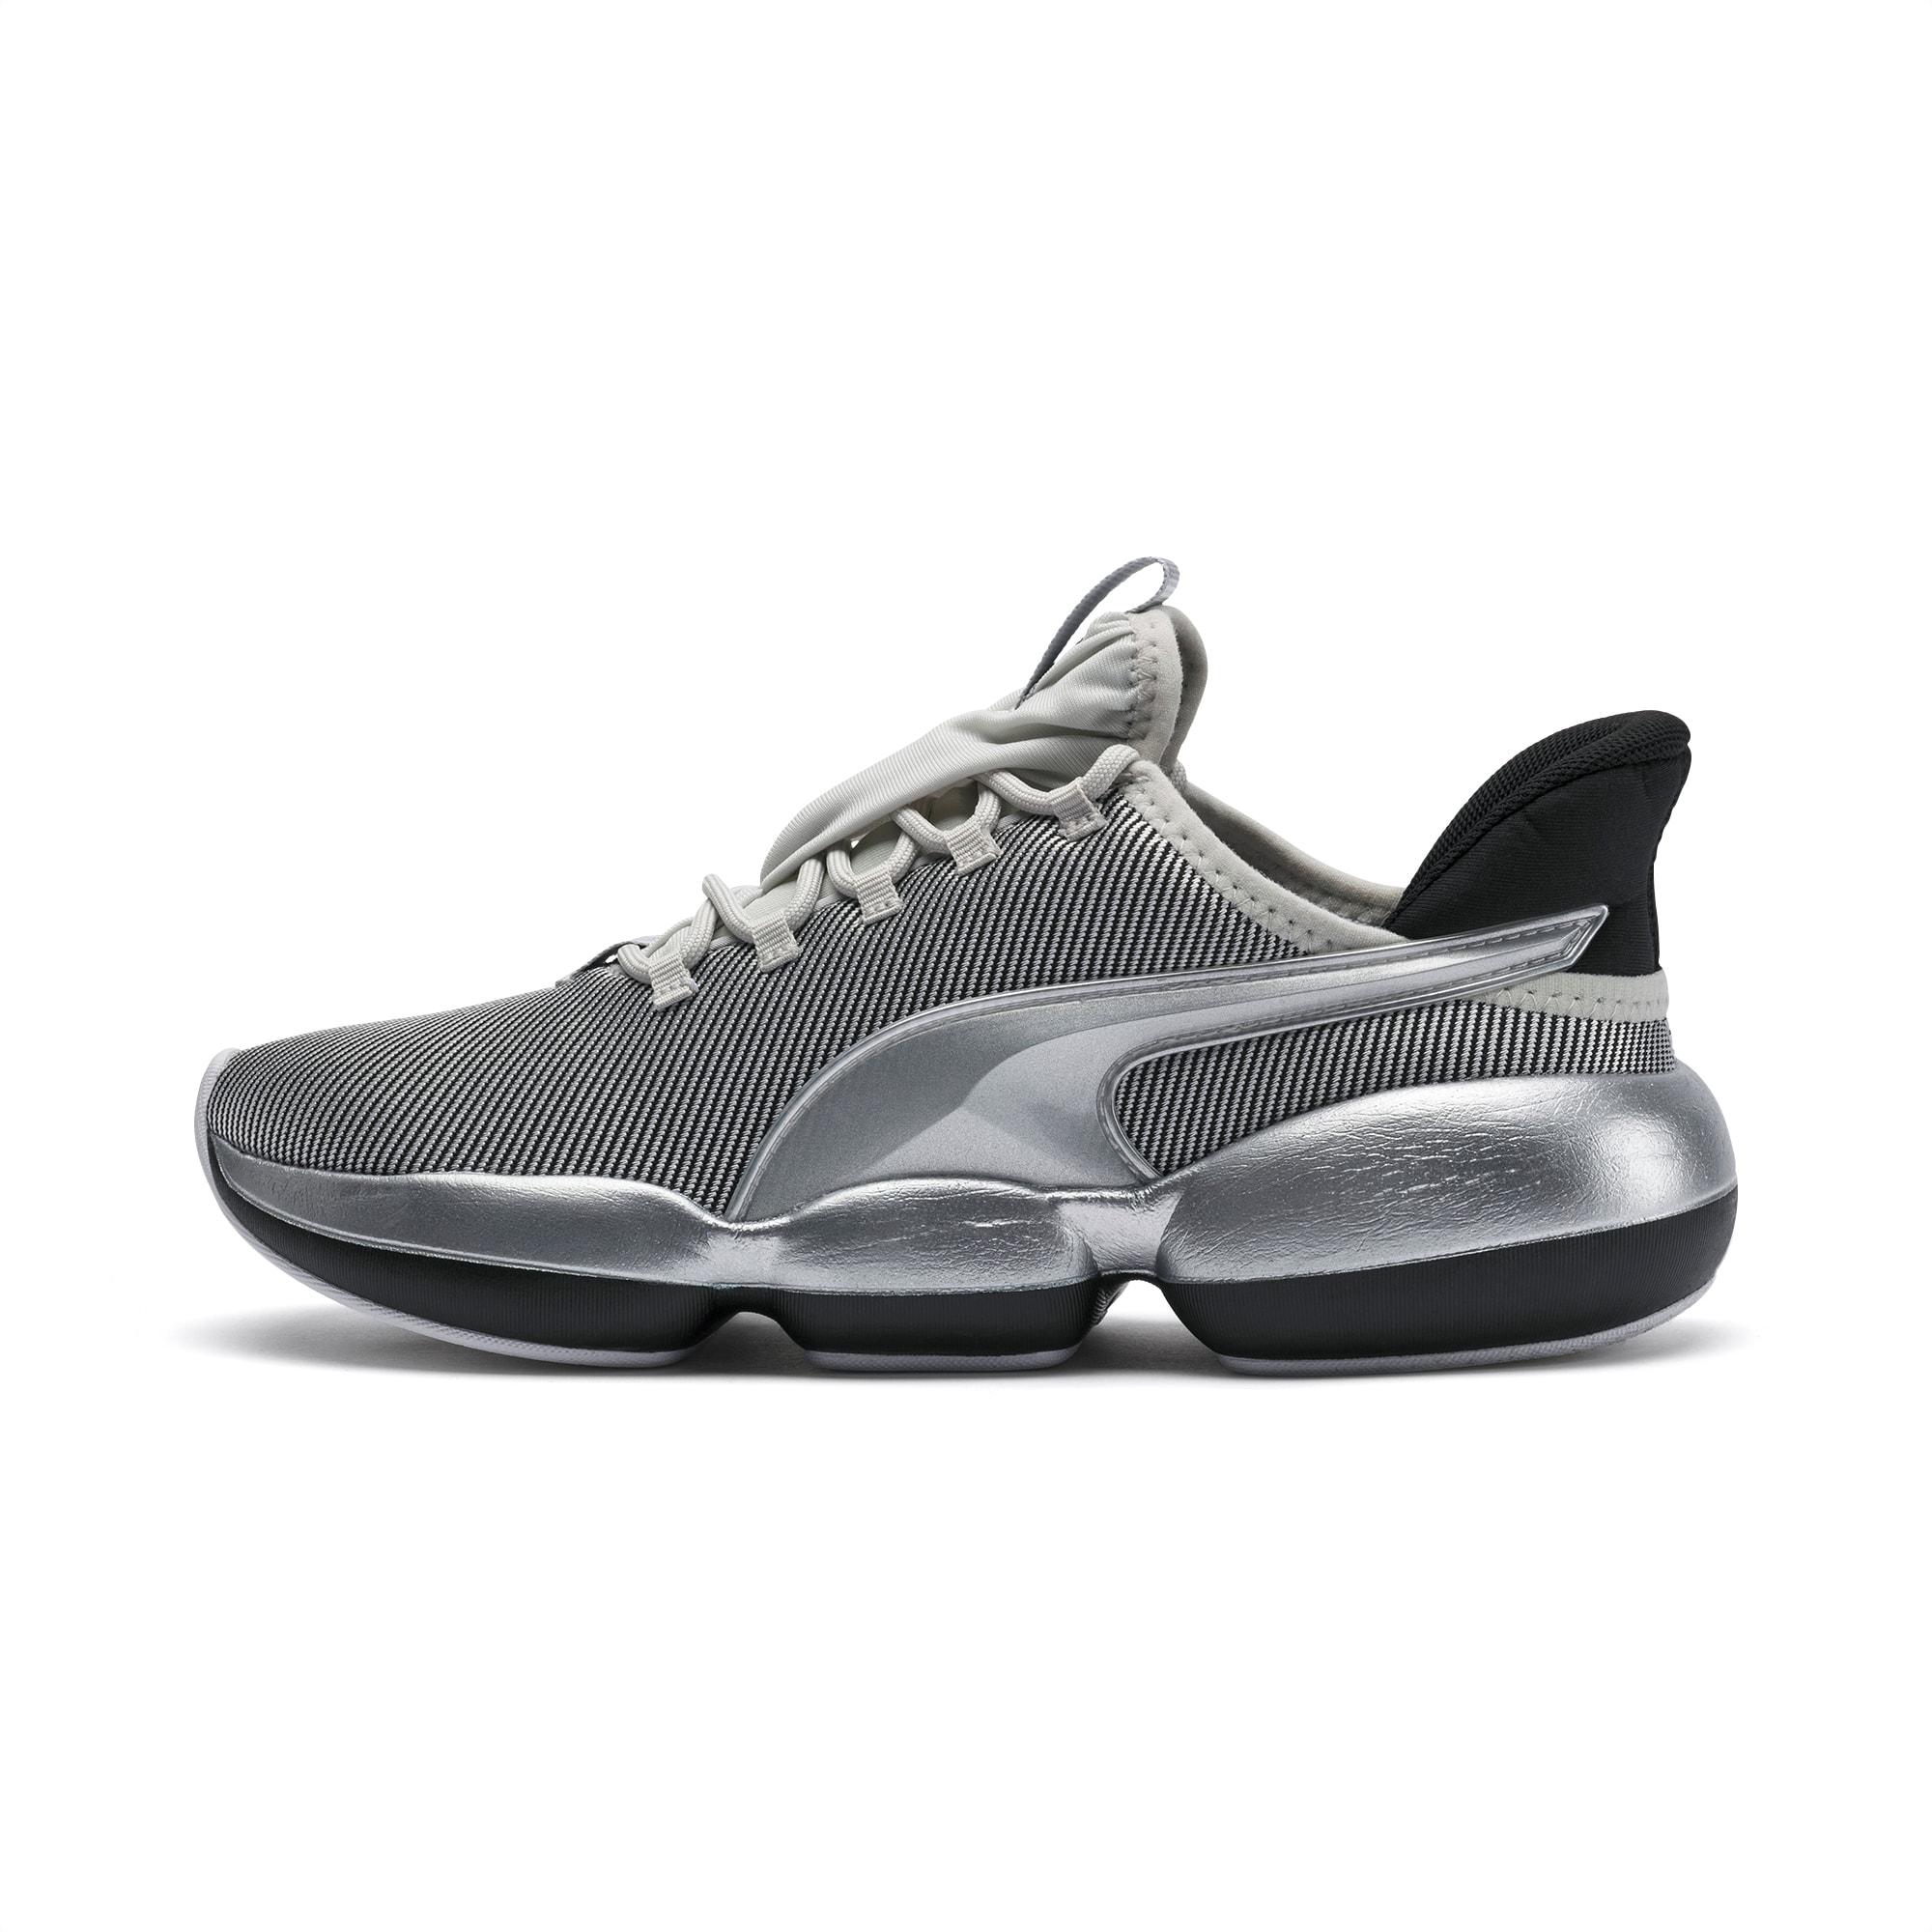 Mode XT Lust Damen Trainingsschuhe | Glacier Gray Puma Black